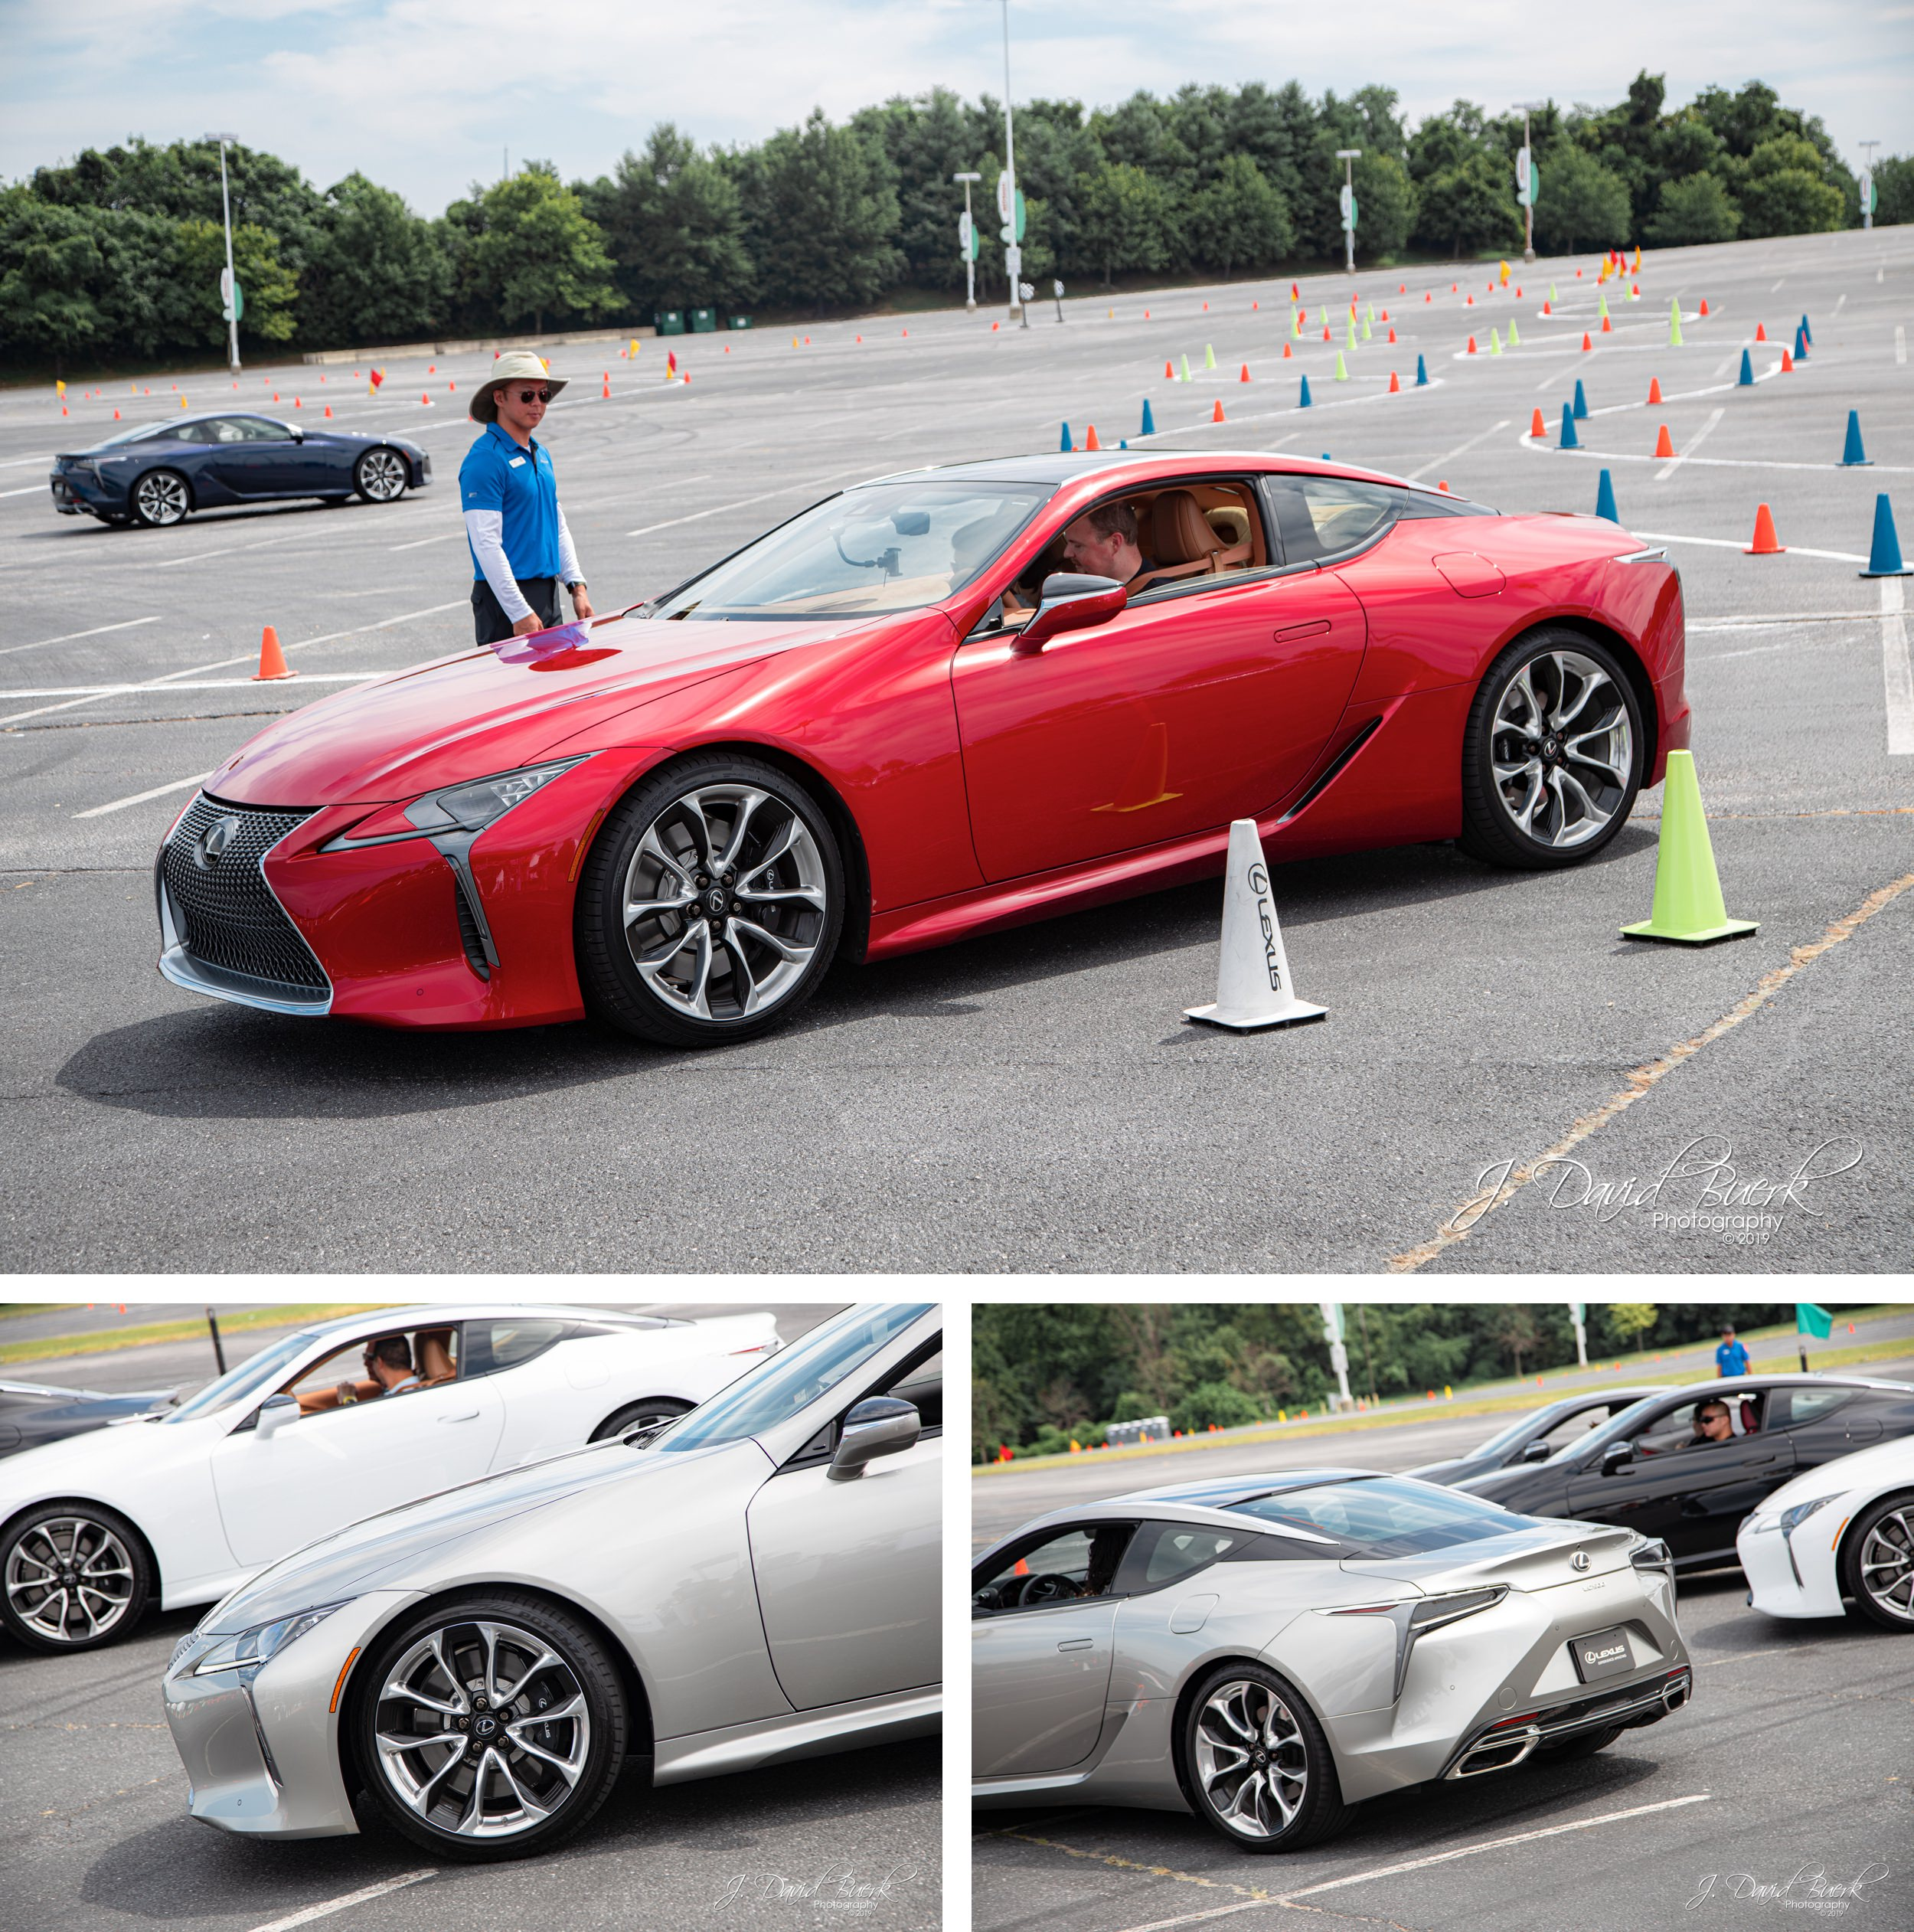 20190810 - Lexus Experience Amazing Drive Event 4.jpg